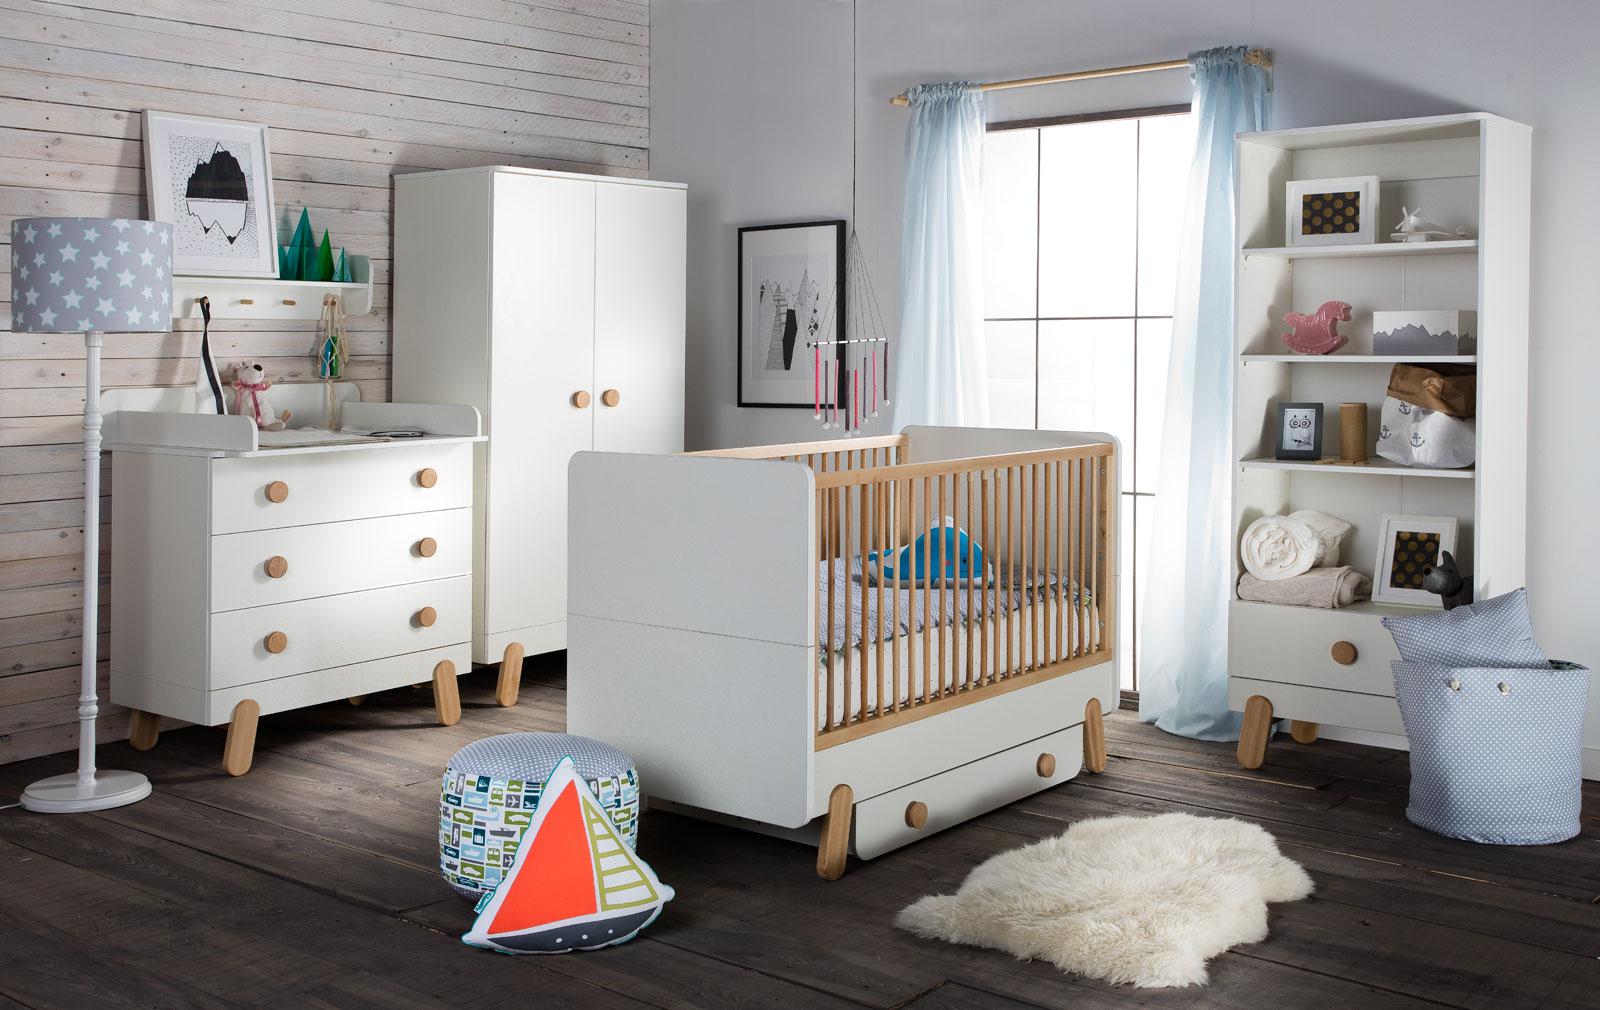 Full Size of Baby Kinderzimmer Komplett Babyzimmer Set 3 Tlg Holz Fancy Online Kaufen Furnart Bad Komplettset Schlafzimmer Günstig Mit Lattenrost Und Matratze Sofa Poco Kinderzimmer Baby Kinderzimmer Komplett